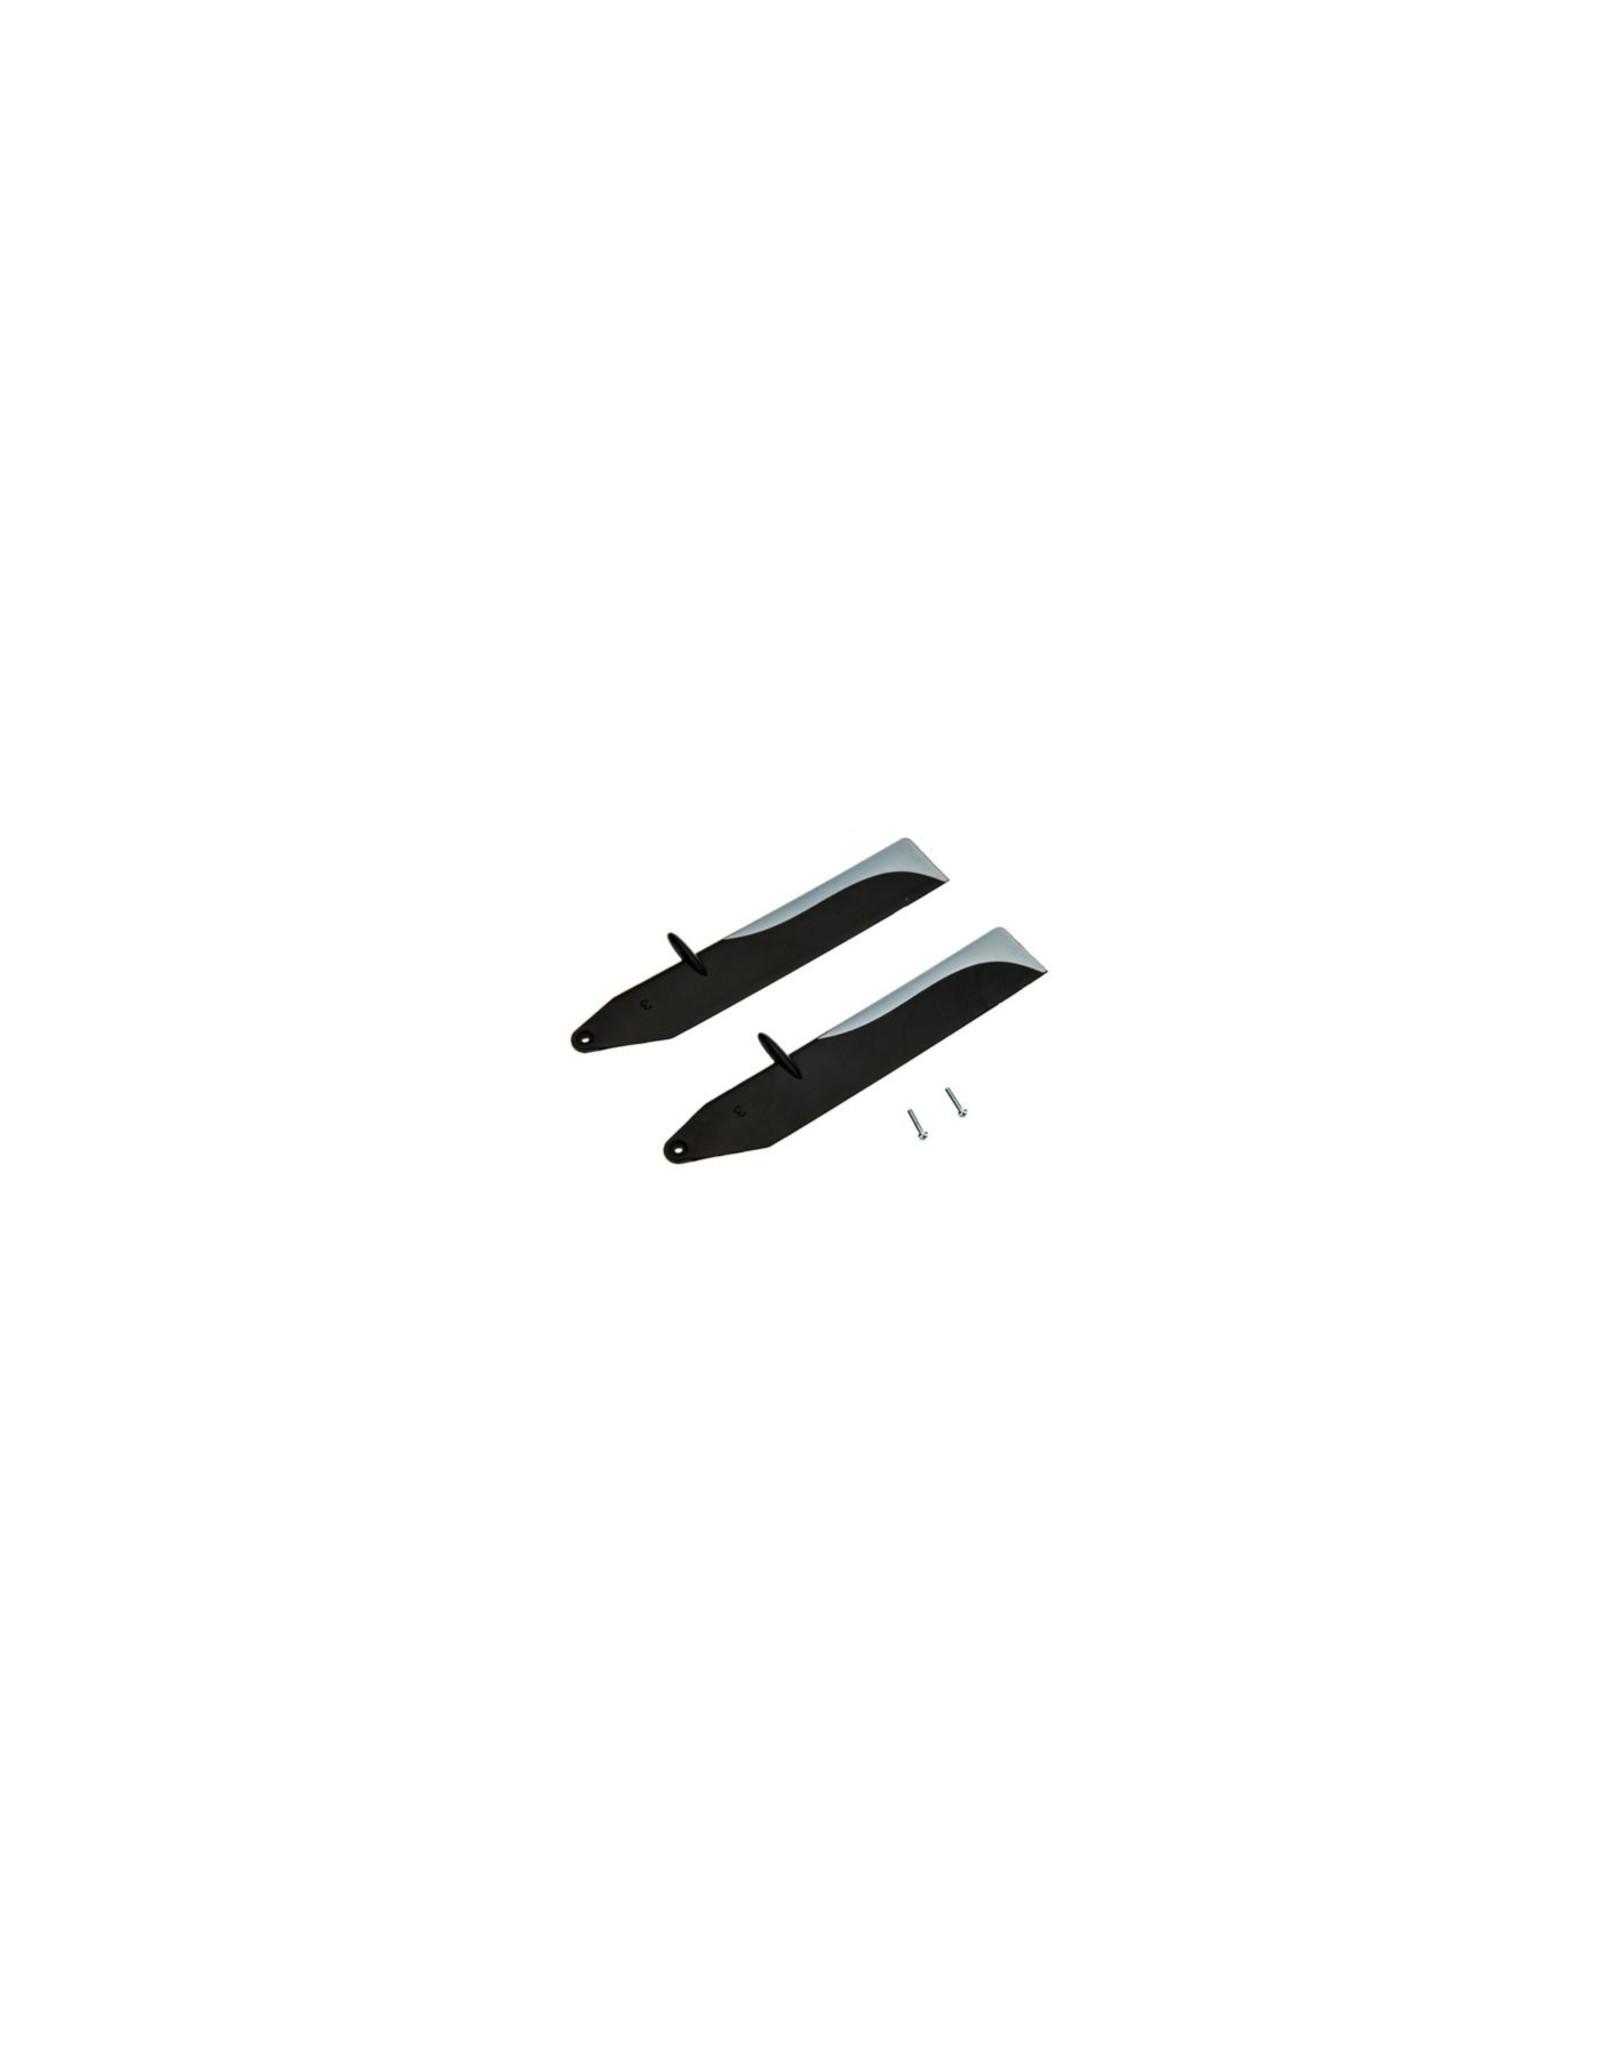 Blade 1305 - Main Rotor Blade Set: Nano S2